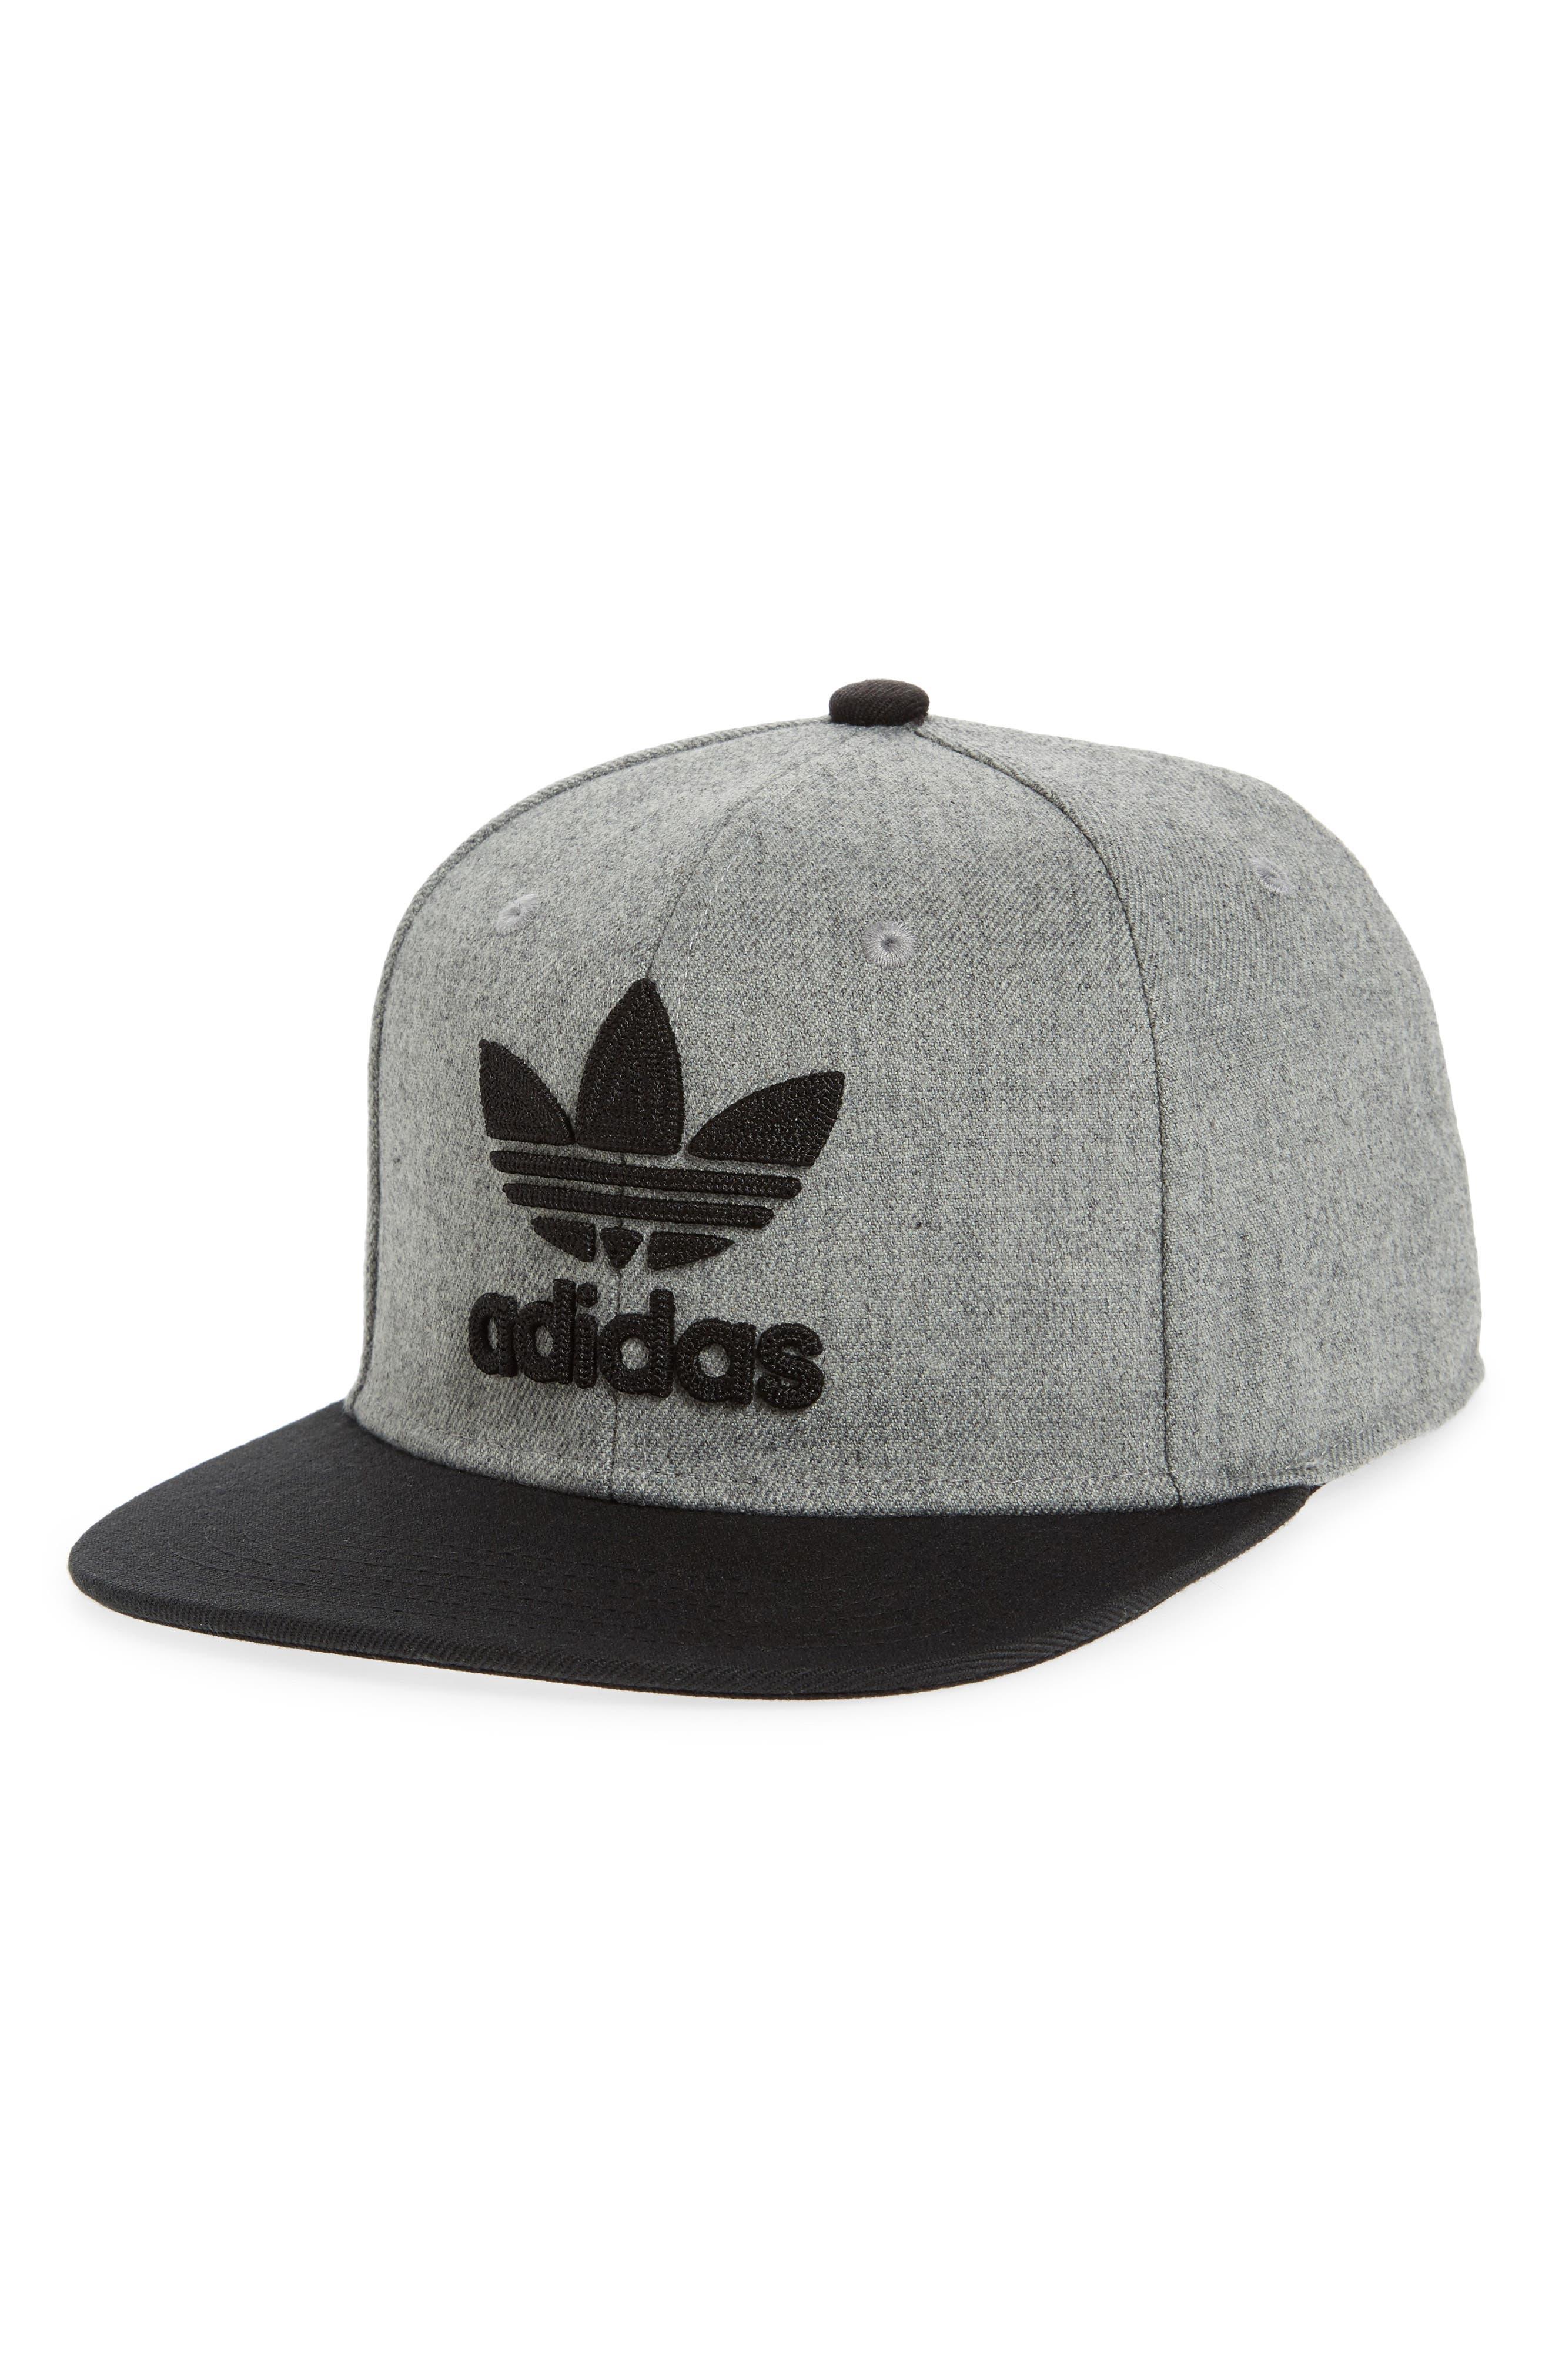 Main Image - adidas Originals Trefoil Chain Snapback Baseball Cap